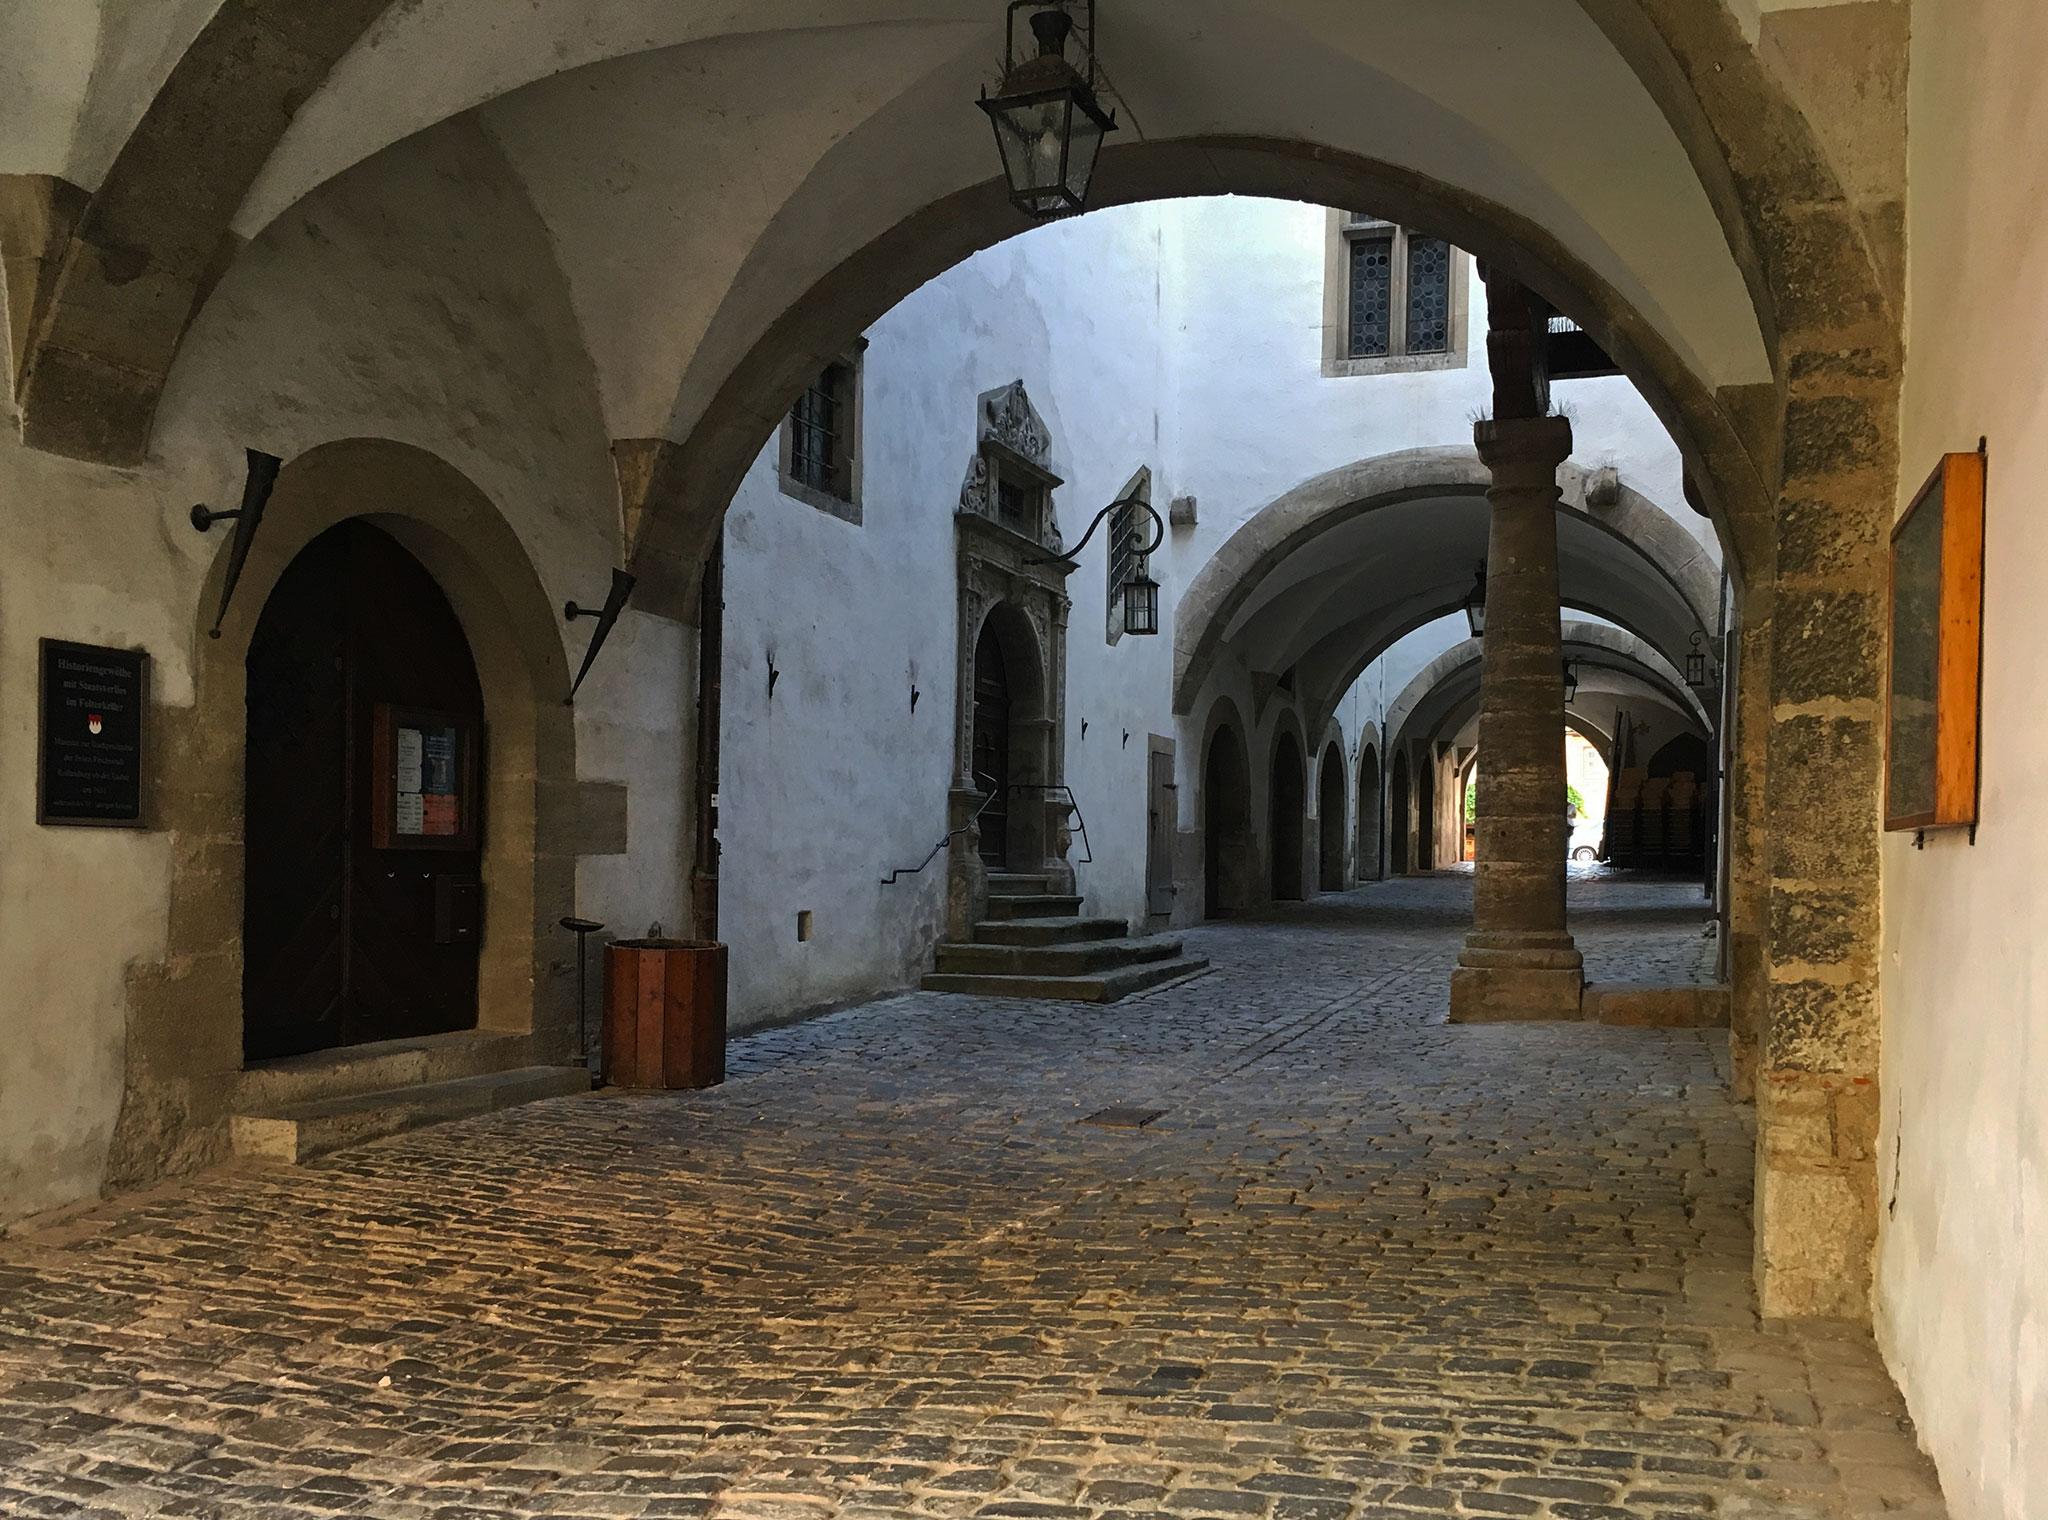 Rothenburg passage